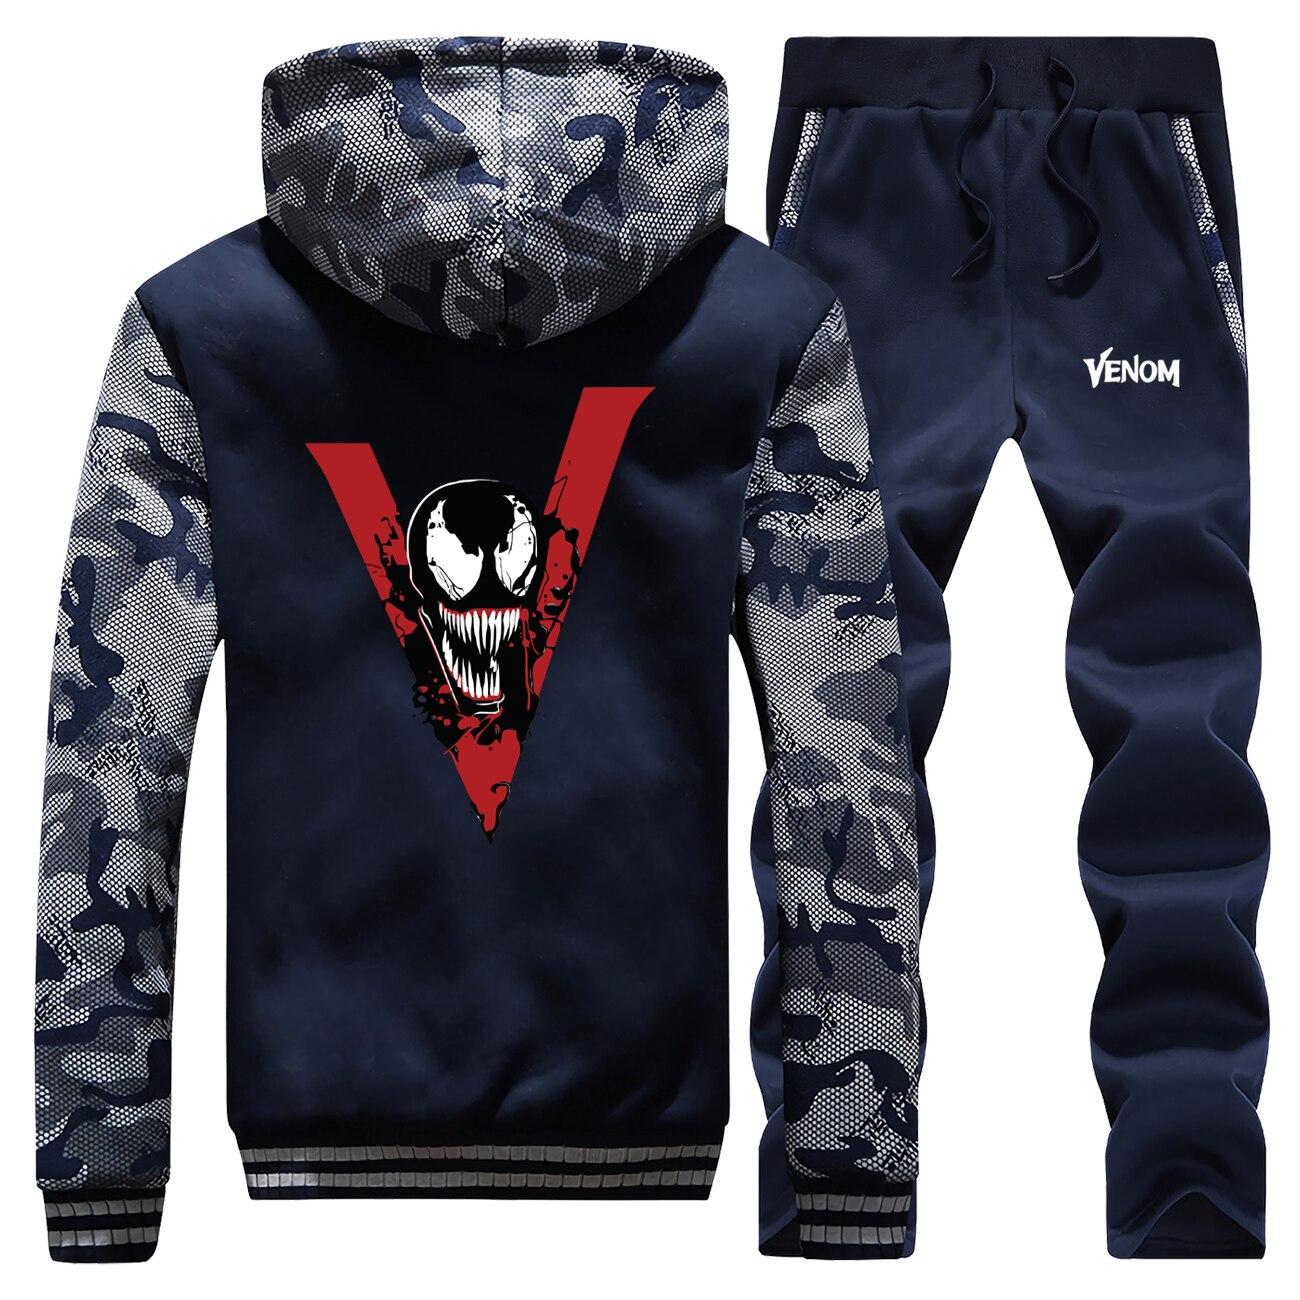 Venom Thicken Hoodies Men Fashion Brand Sweatshirt+Pants 2 Piece Sets Superhero Camo Jacket Mens Winter Hoodie Warm Suit Coats